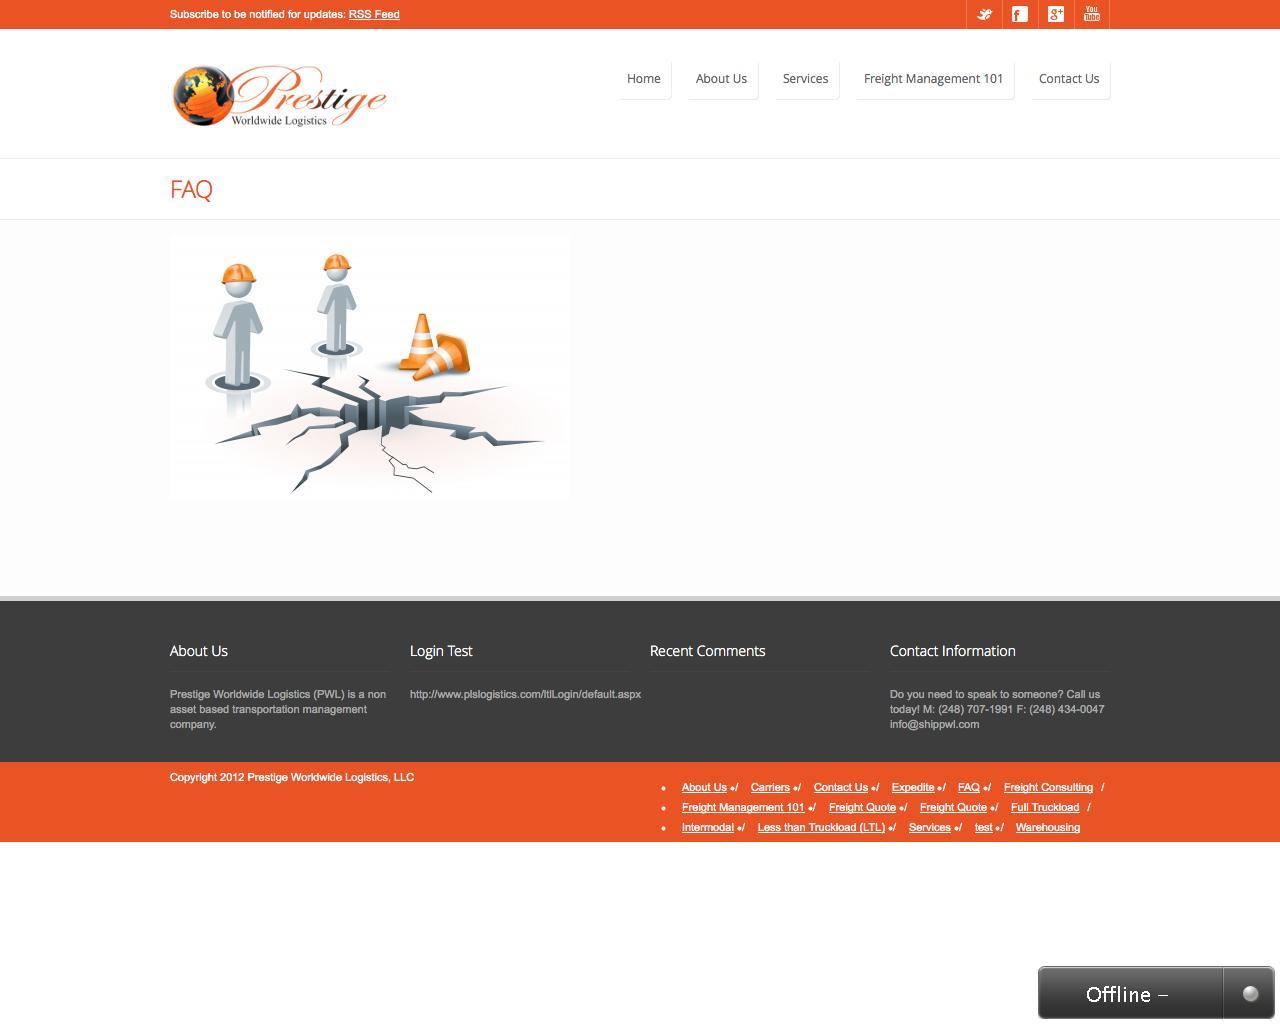 Web Design Example | A page on shippwl com | Crayon